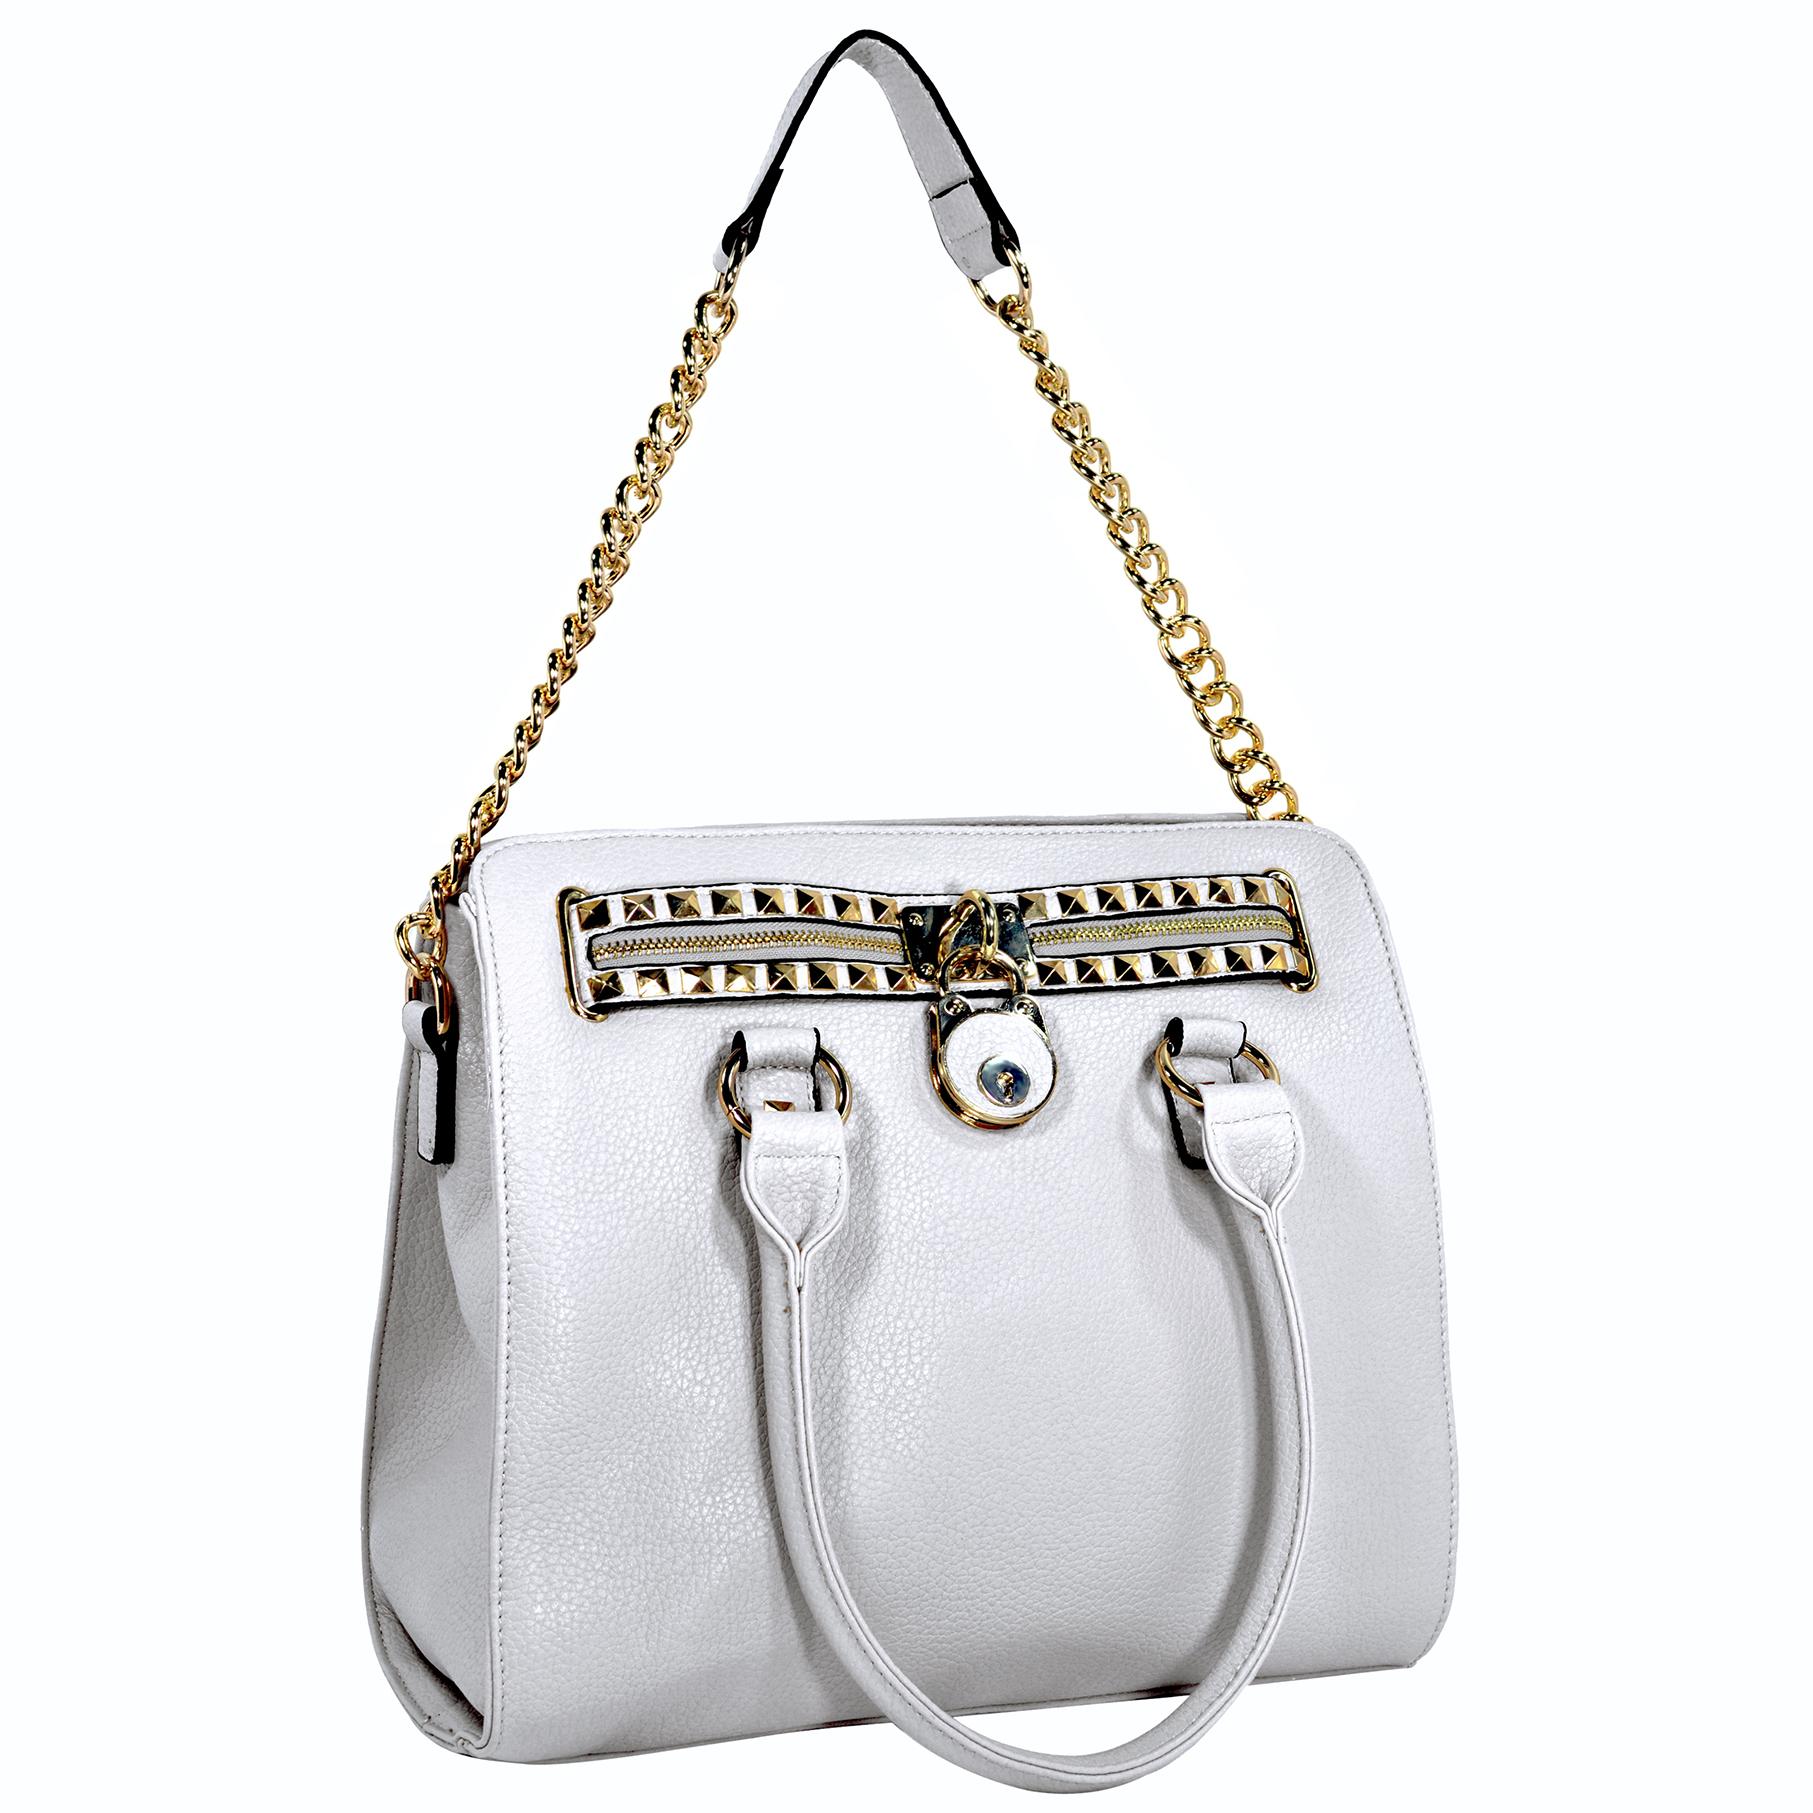 HALEY White Bowler Style Handbag Handle